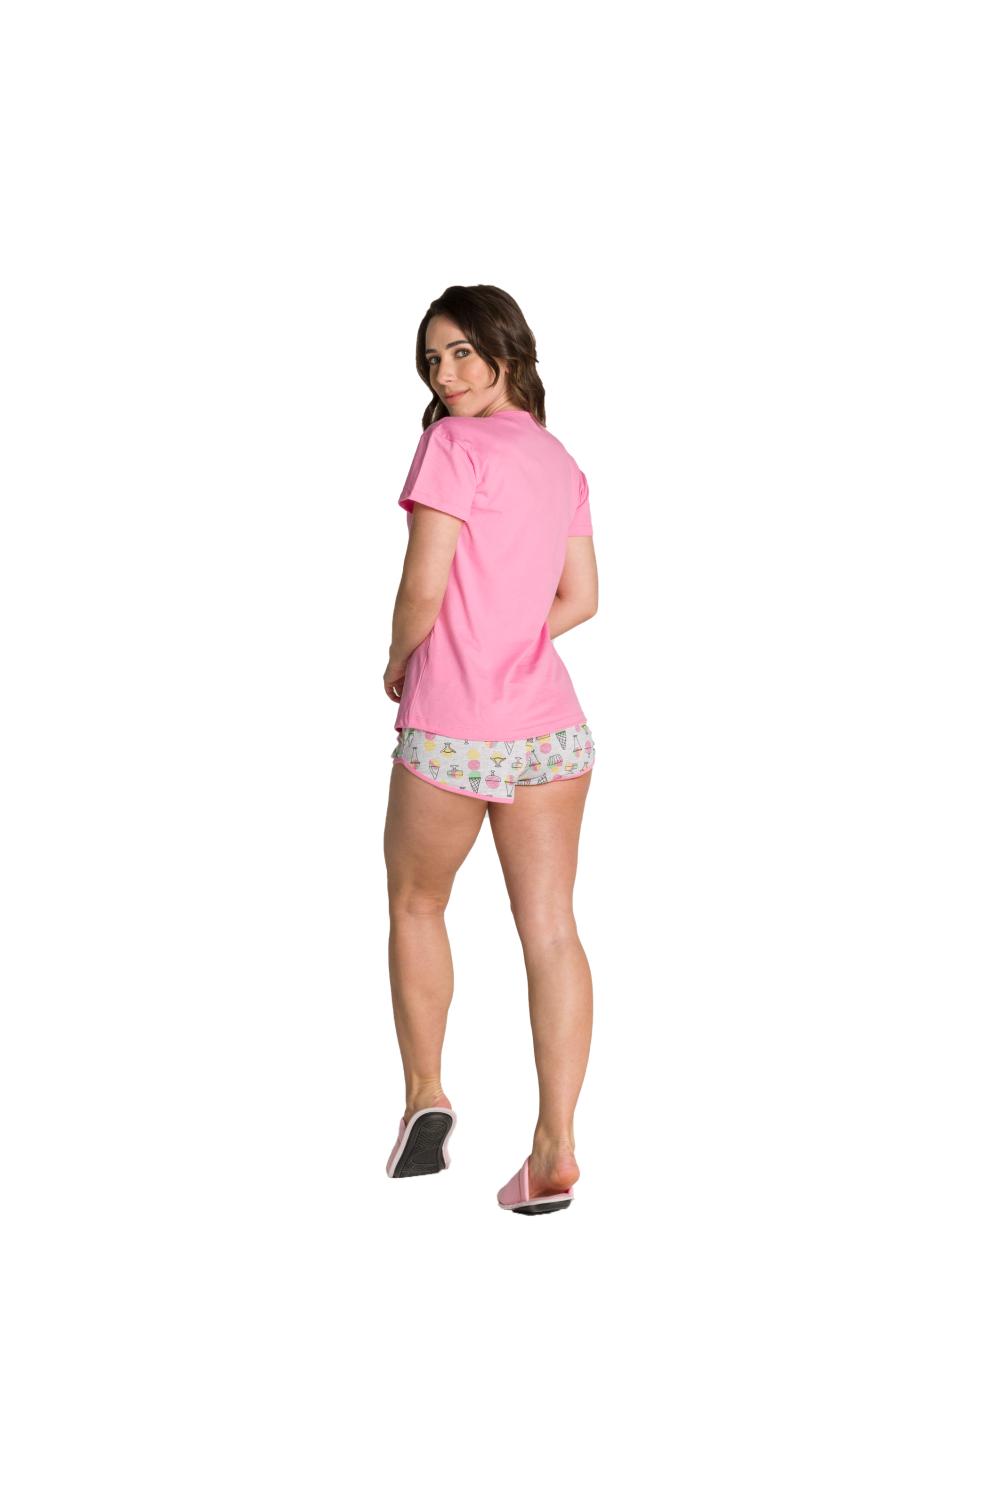 009/B - Pijama Adulto Feminino Curto Estampa Glitter - Mãe e Filha